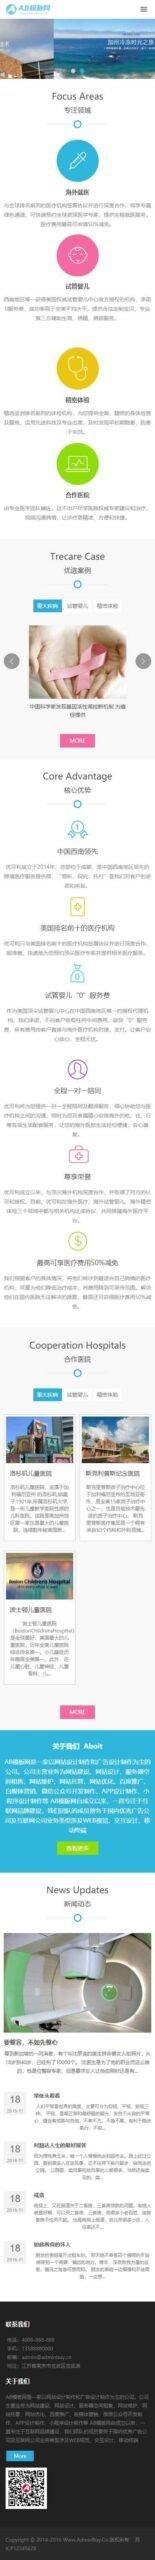 D53织梦医疗科技模板dedecms自适应手机版企业网站模板源码